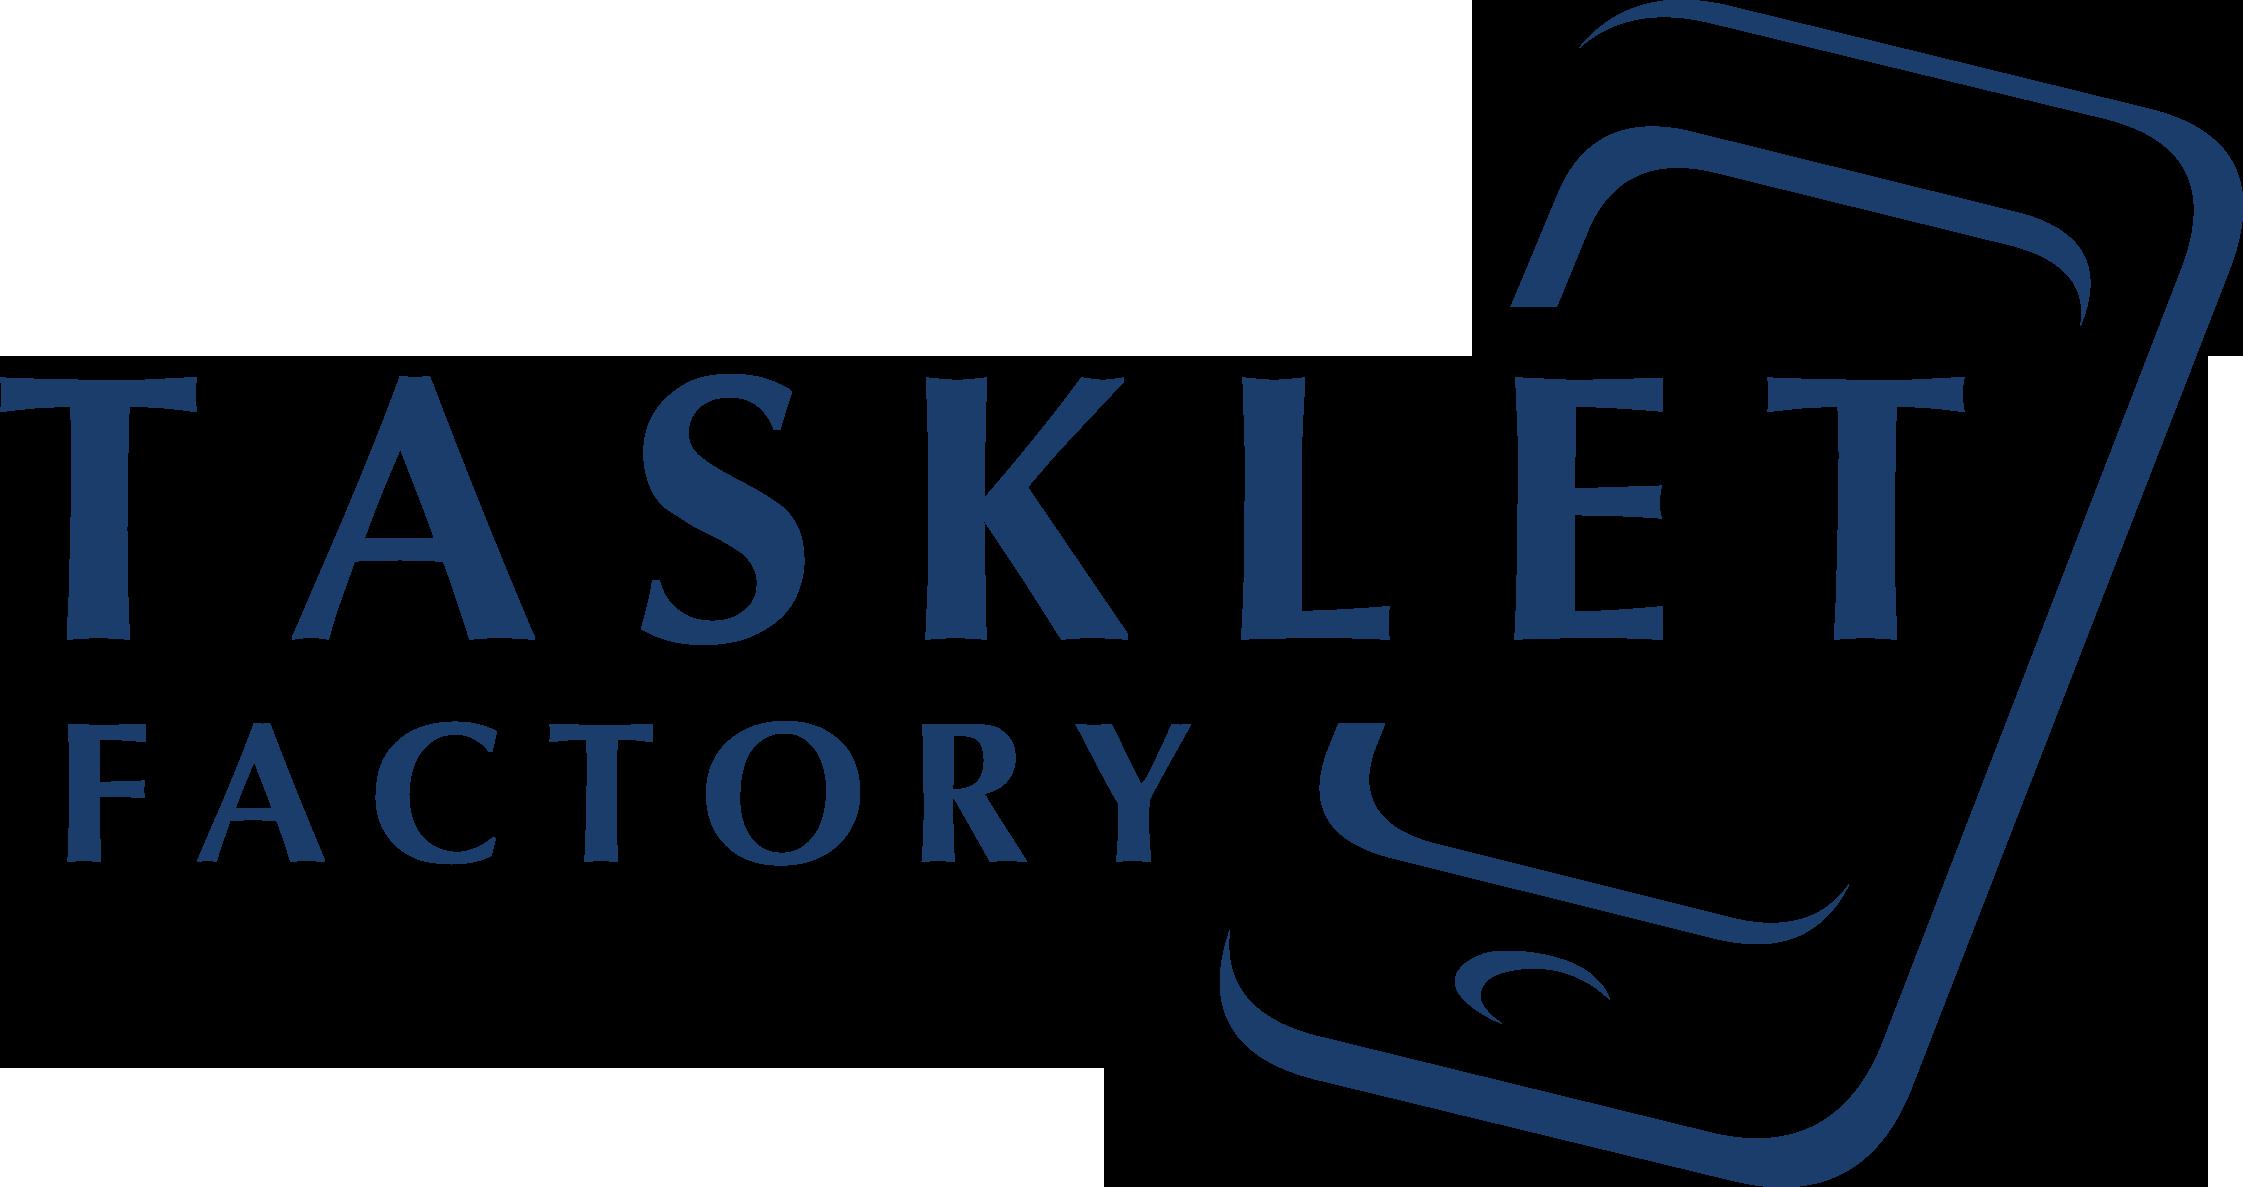 Tasklet Factory Logo